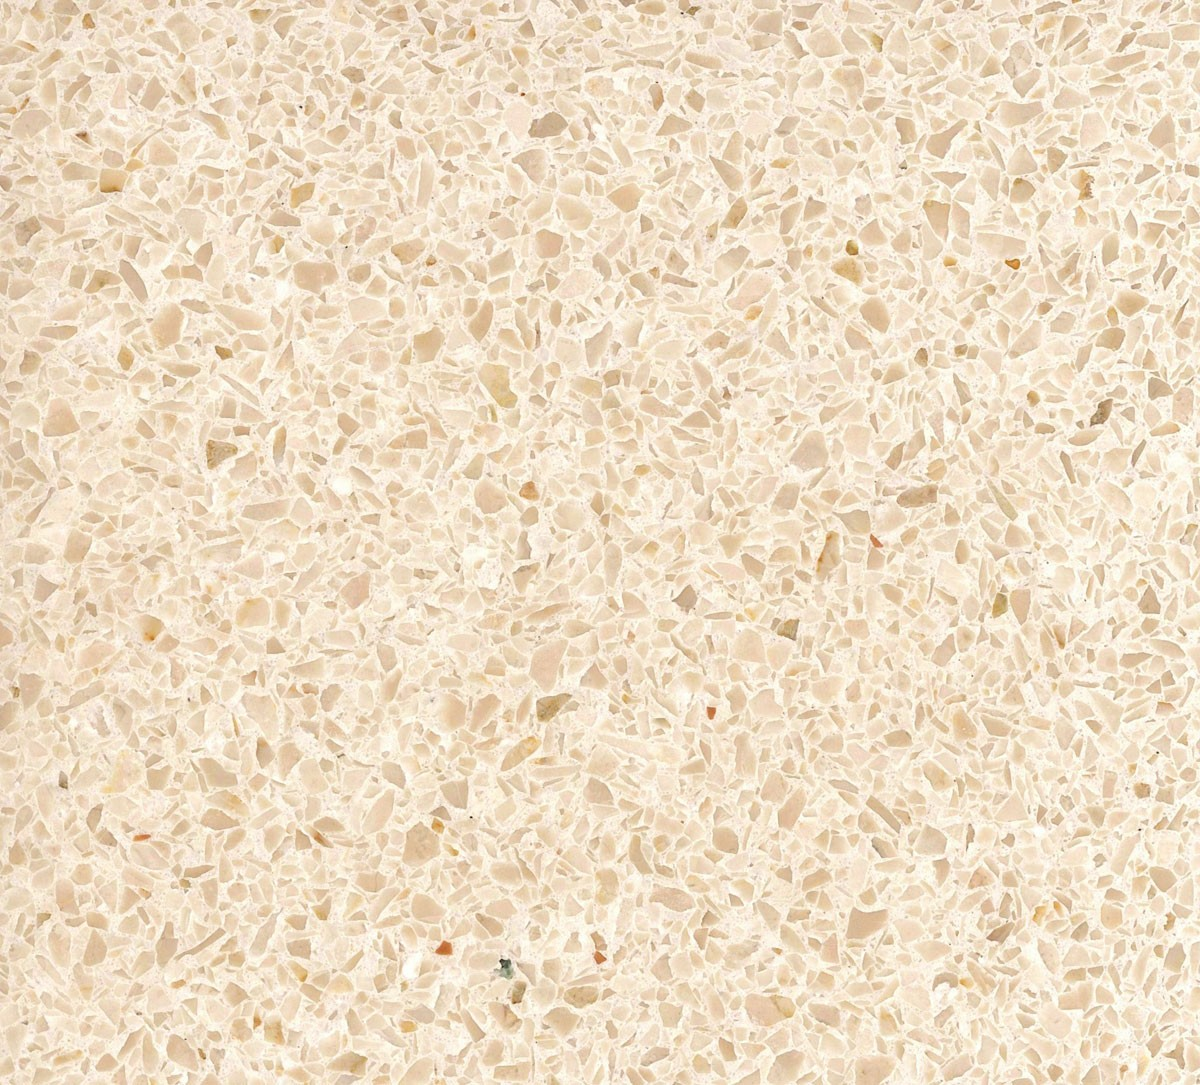 Crema Terrazzo Marble Trend Marble Granite Tiles